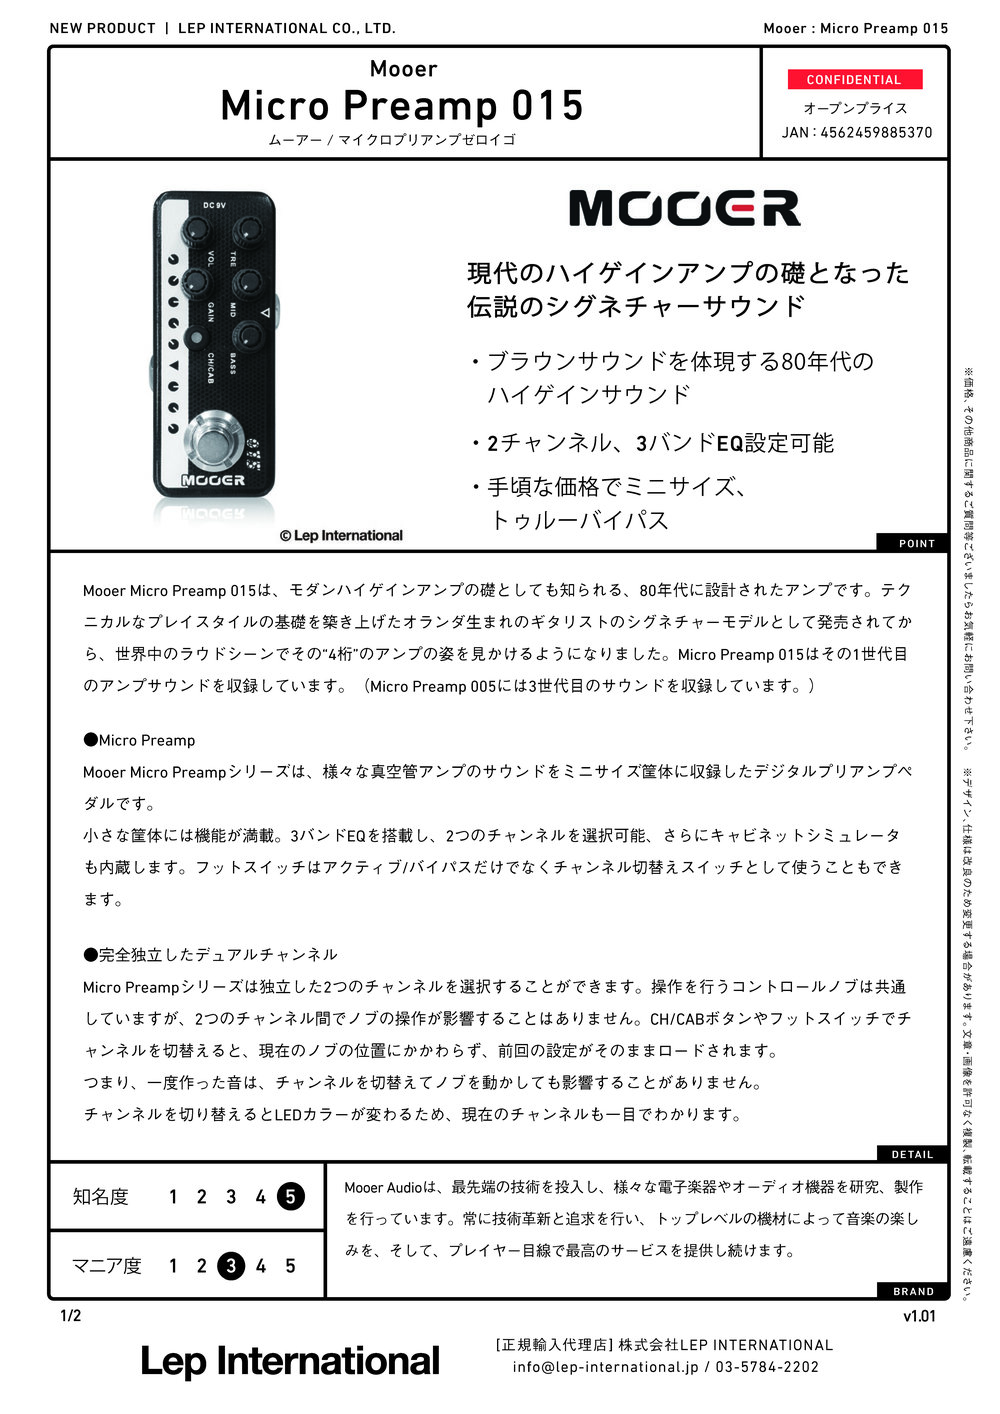 mooer micropreamp015 v1.01_ページ_1.jpg